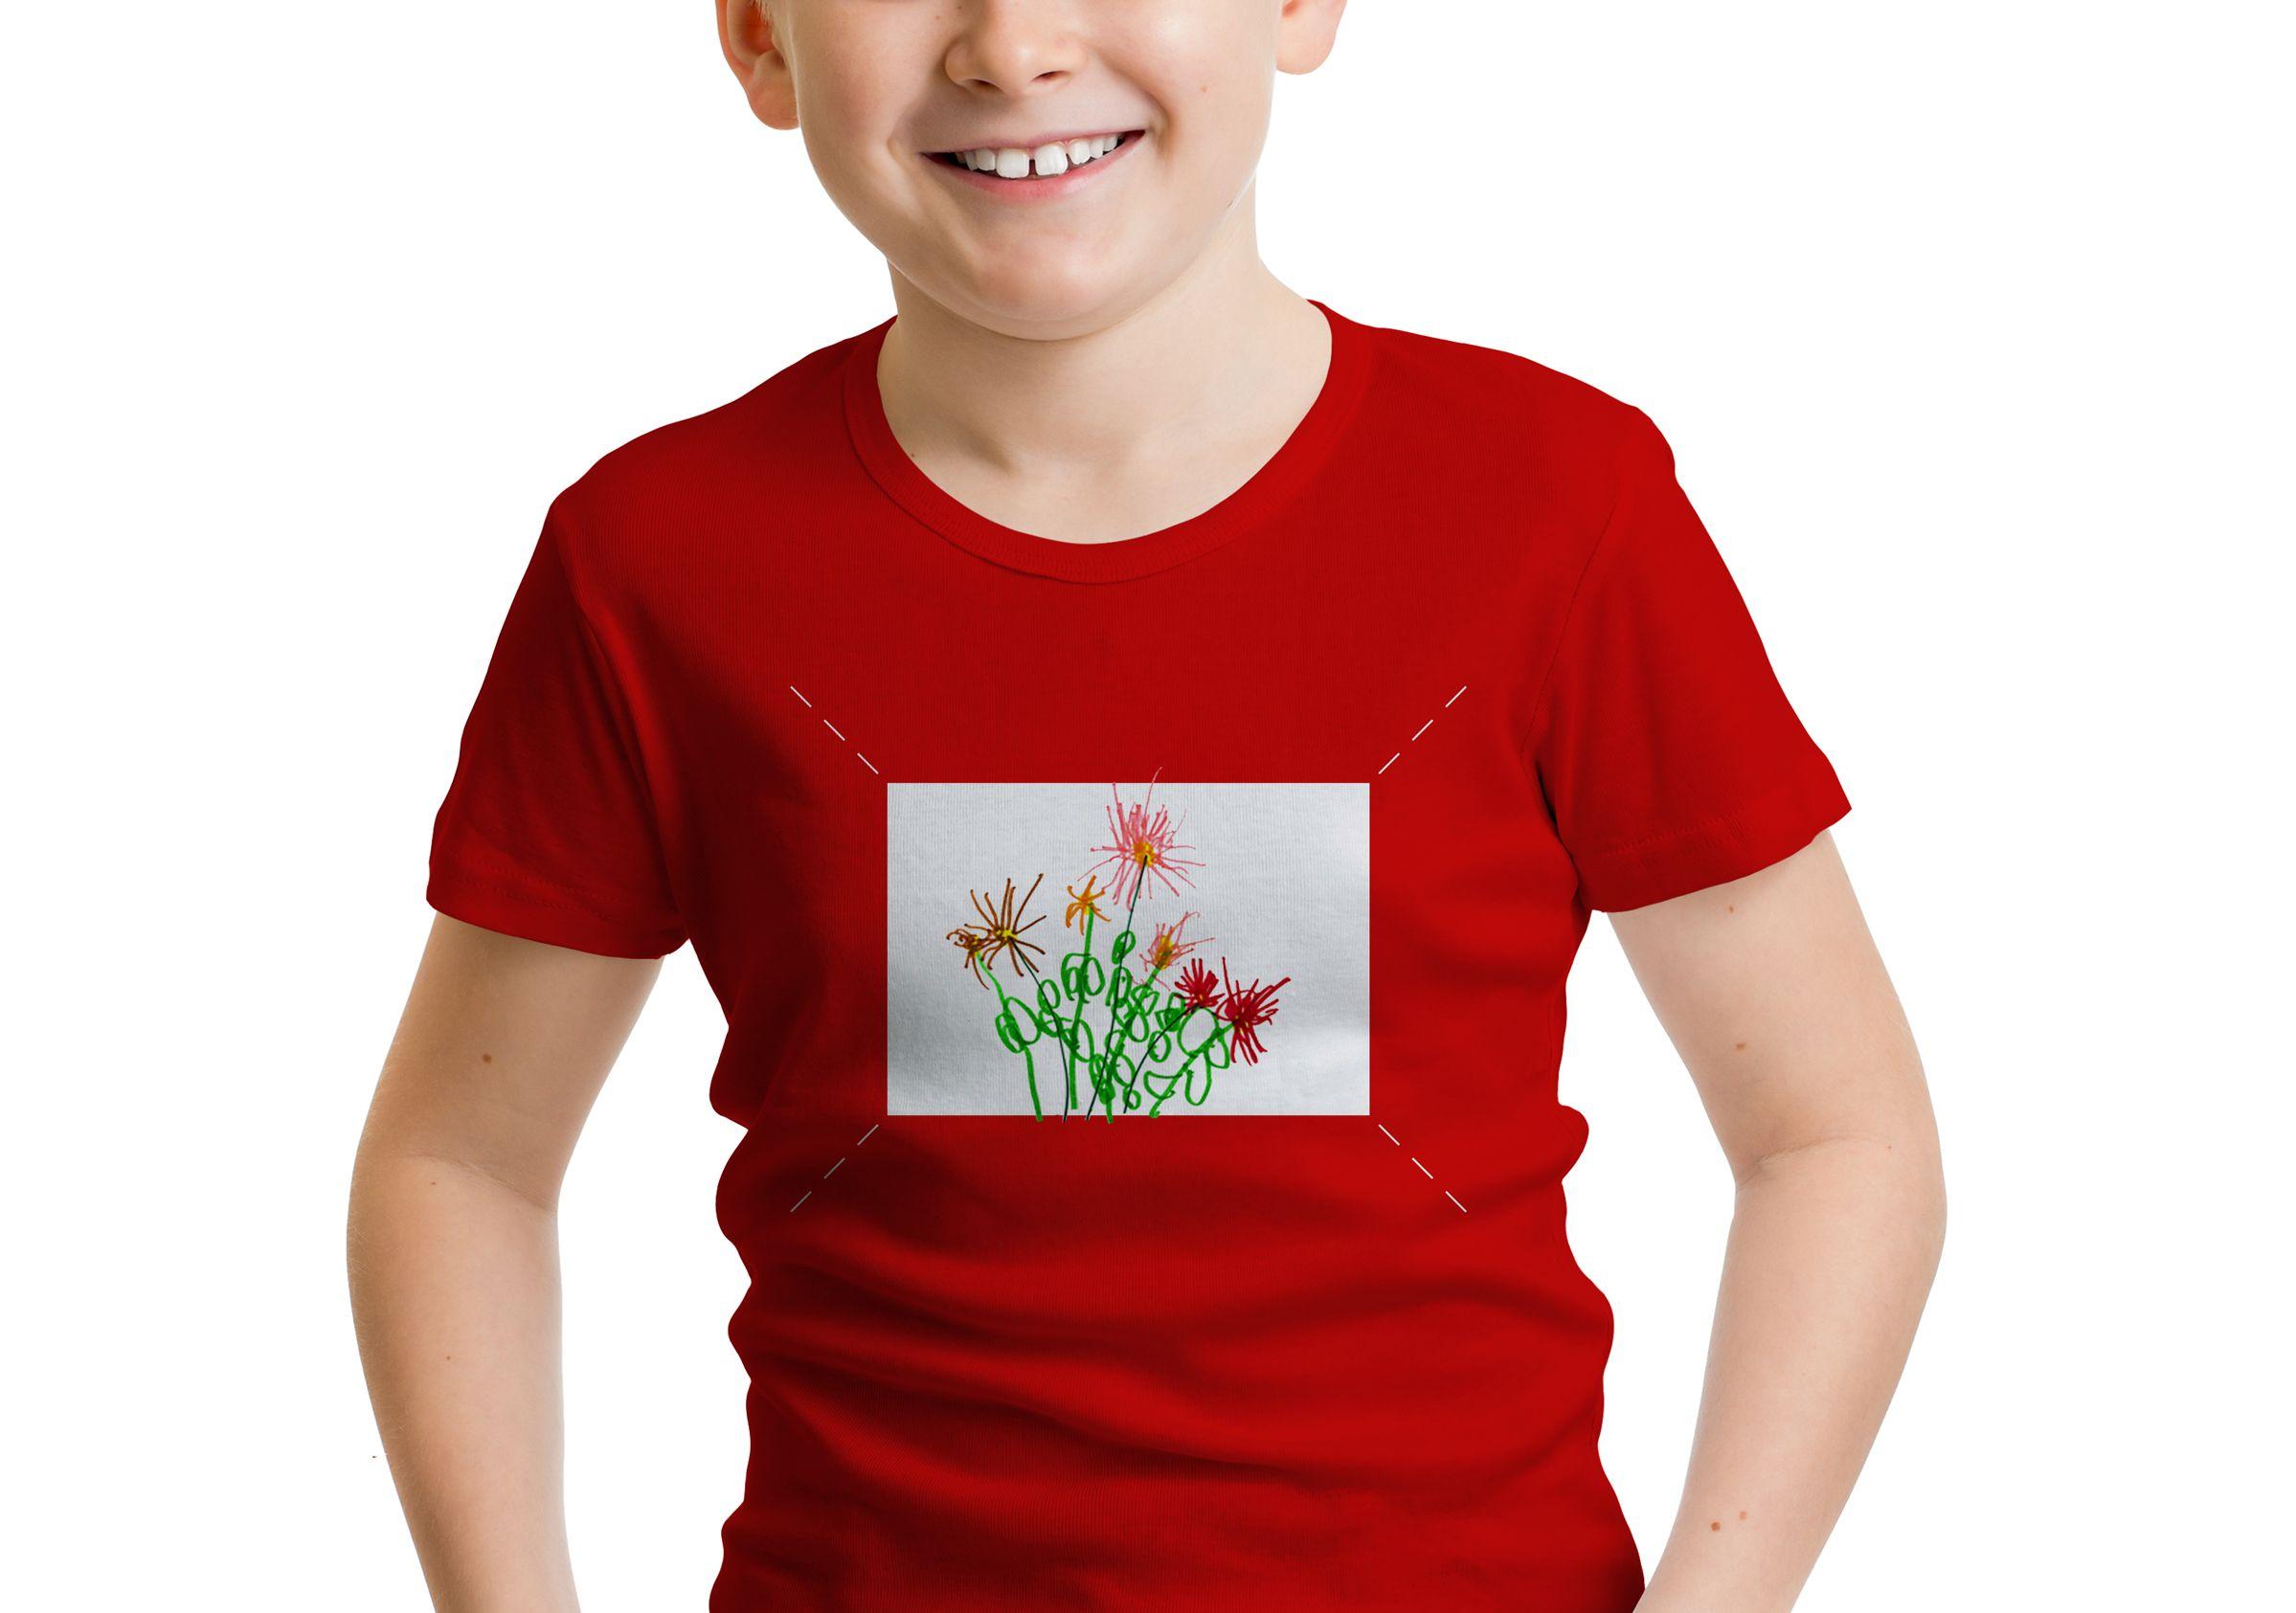 National Gallery of Canada Magazine T-Shirt by Ottawa Graphic Designer idApostle